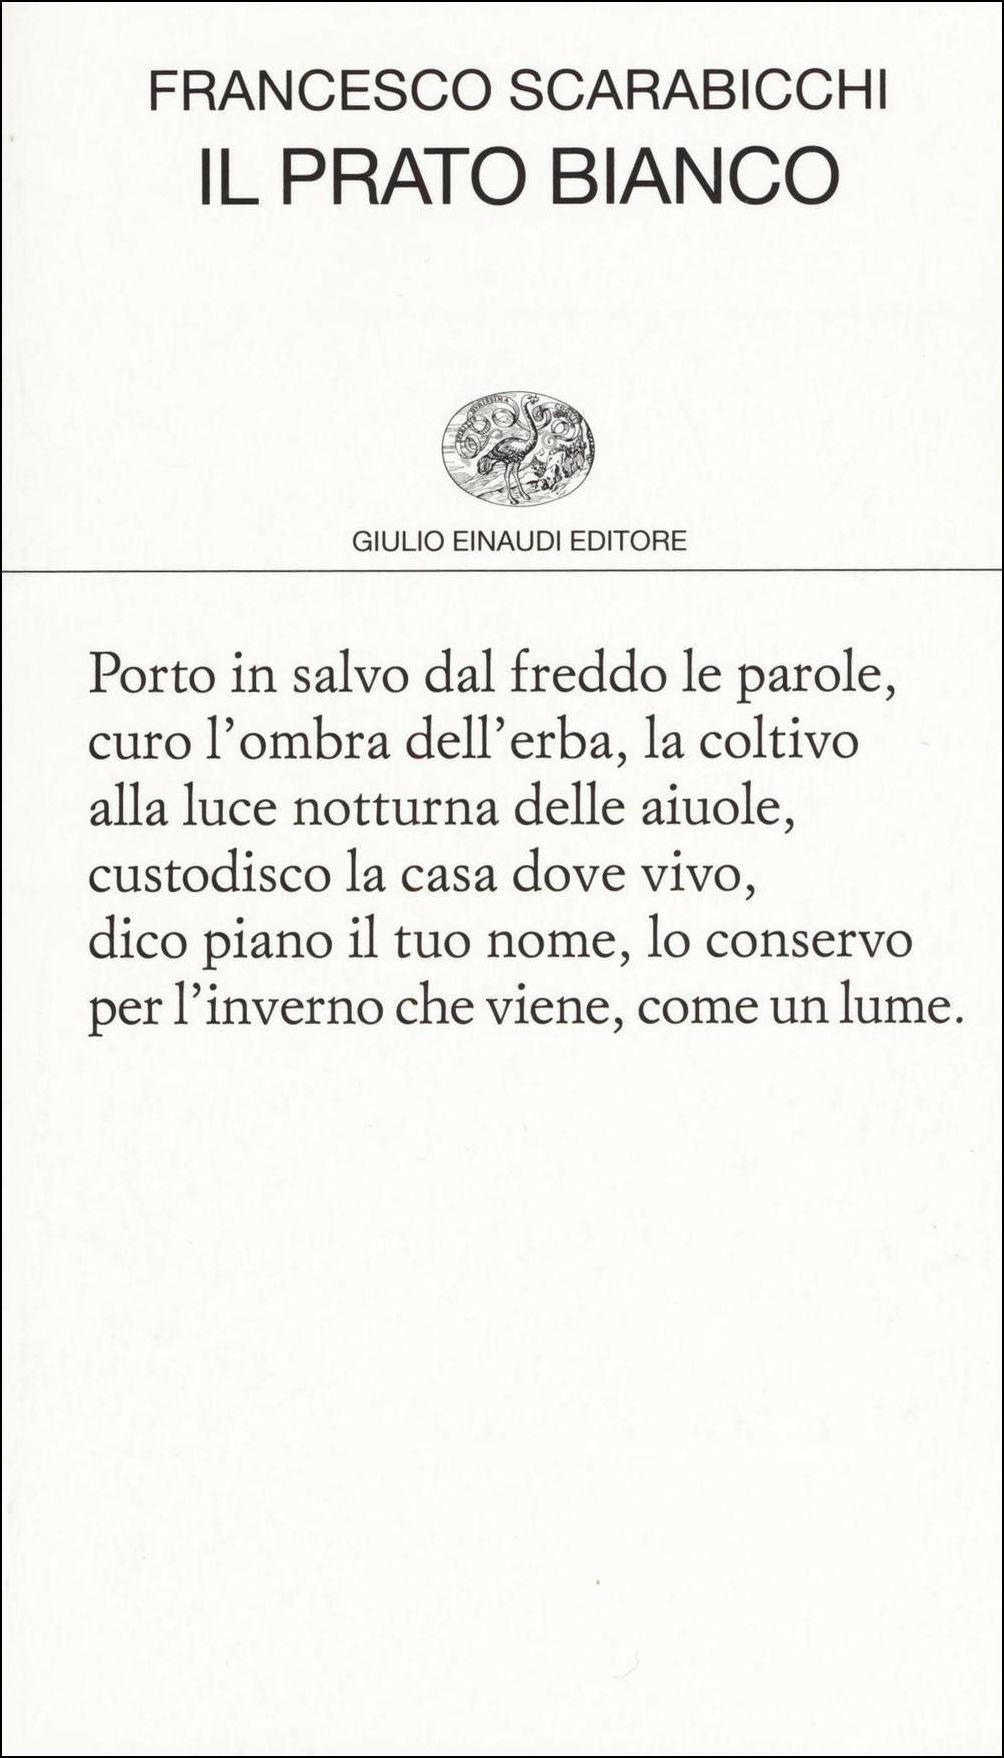 l prato bianco - Francesco Scarabicchi - Einaudi